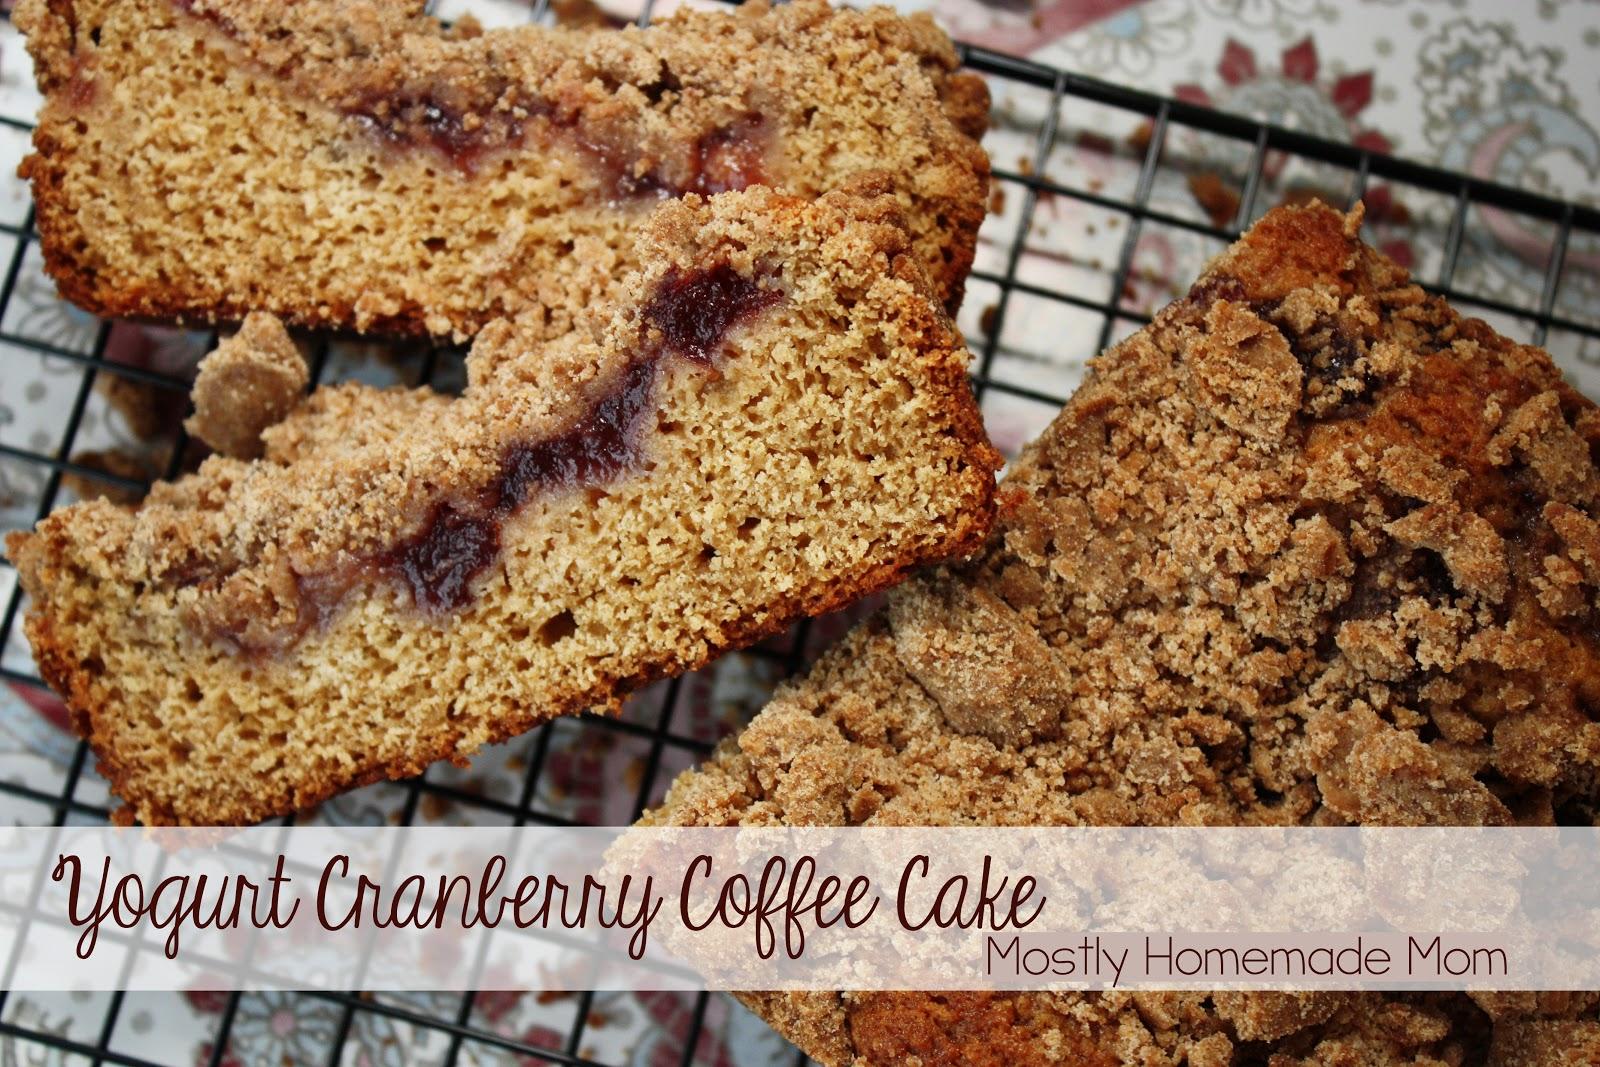 Yogurt Cranberry Coffee Cake